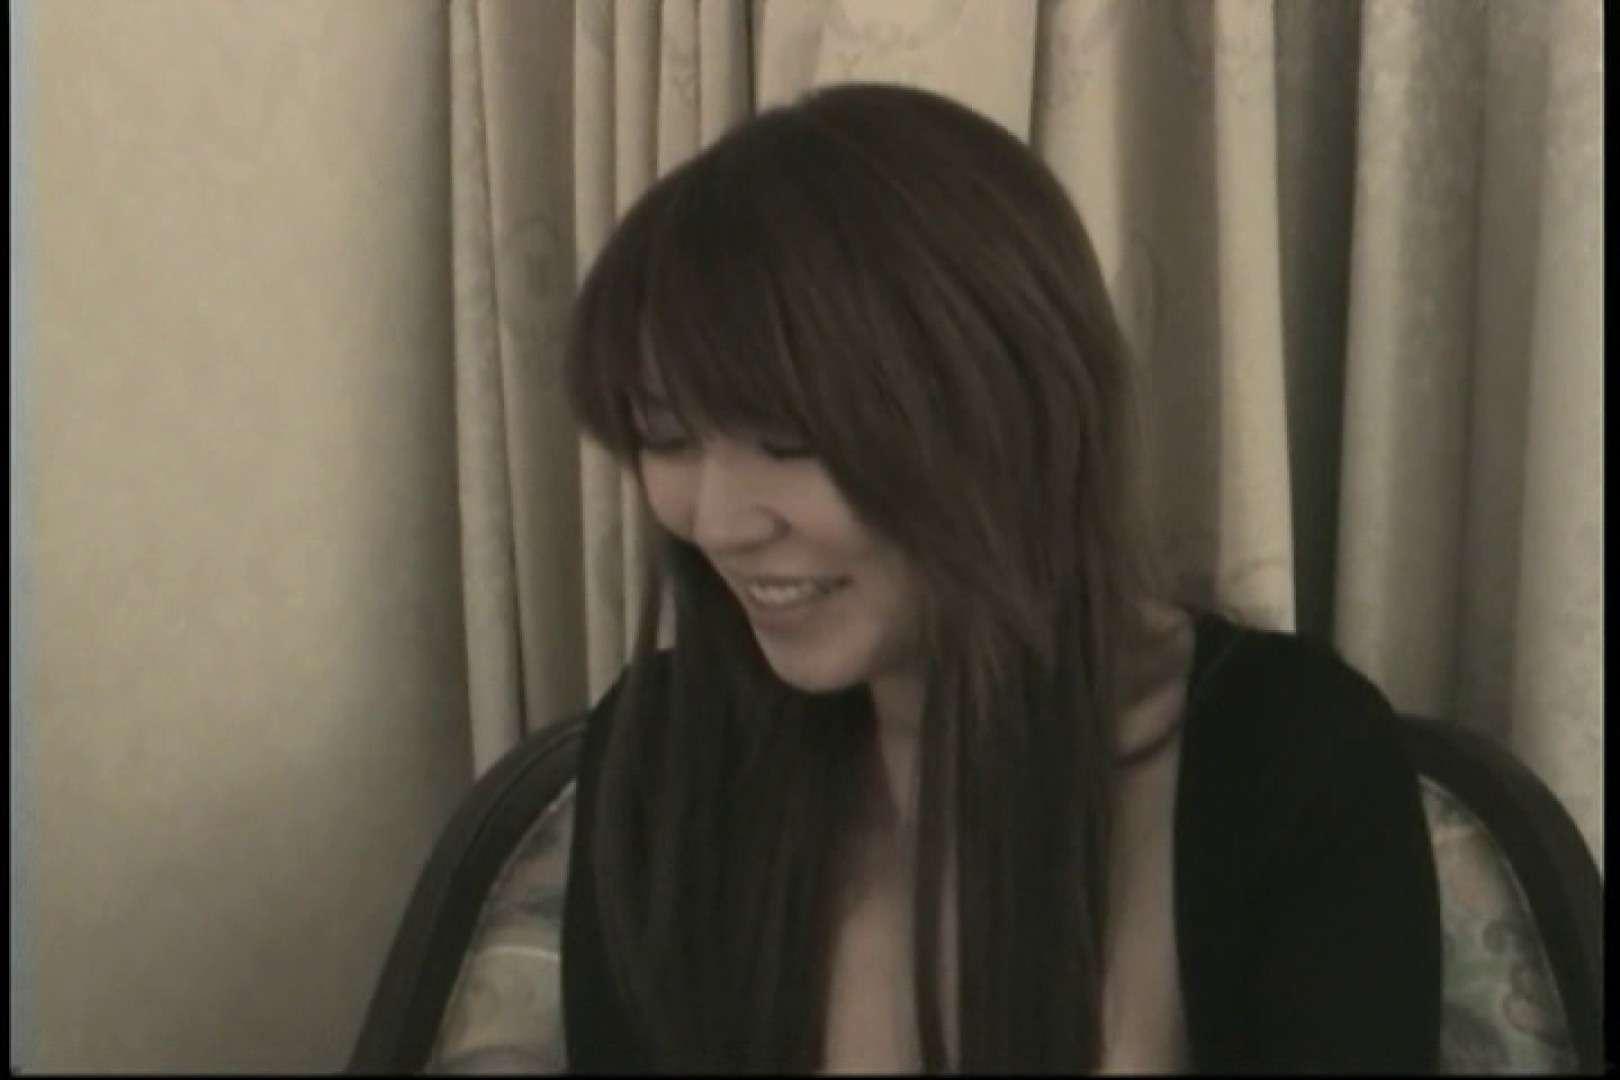 H大好きな清楚系の美ボディお姉さんとホテルでSEX~安西みか~ 超エロお姉さん オメコ動画キャプチャ 97枚 75